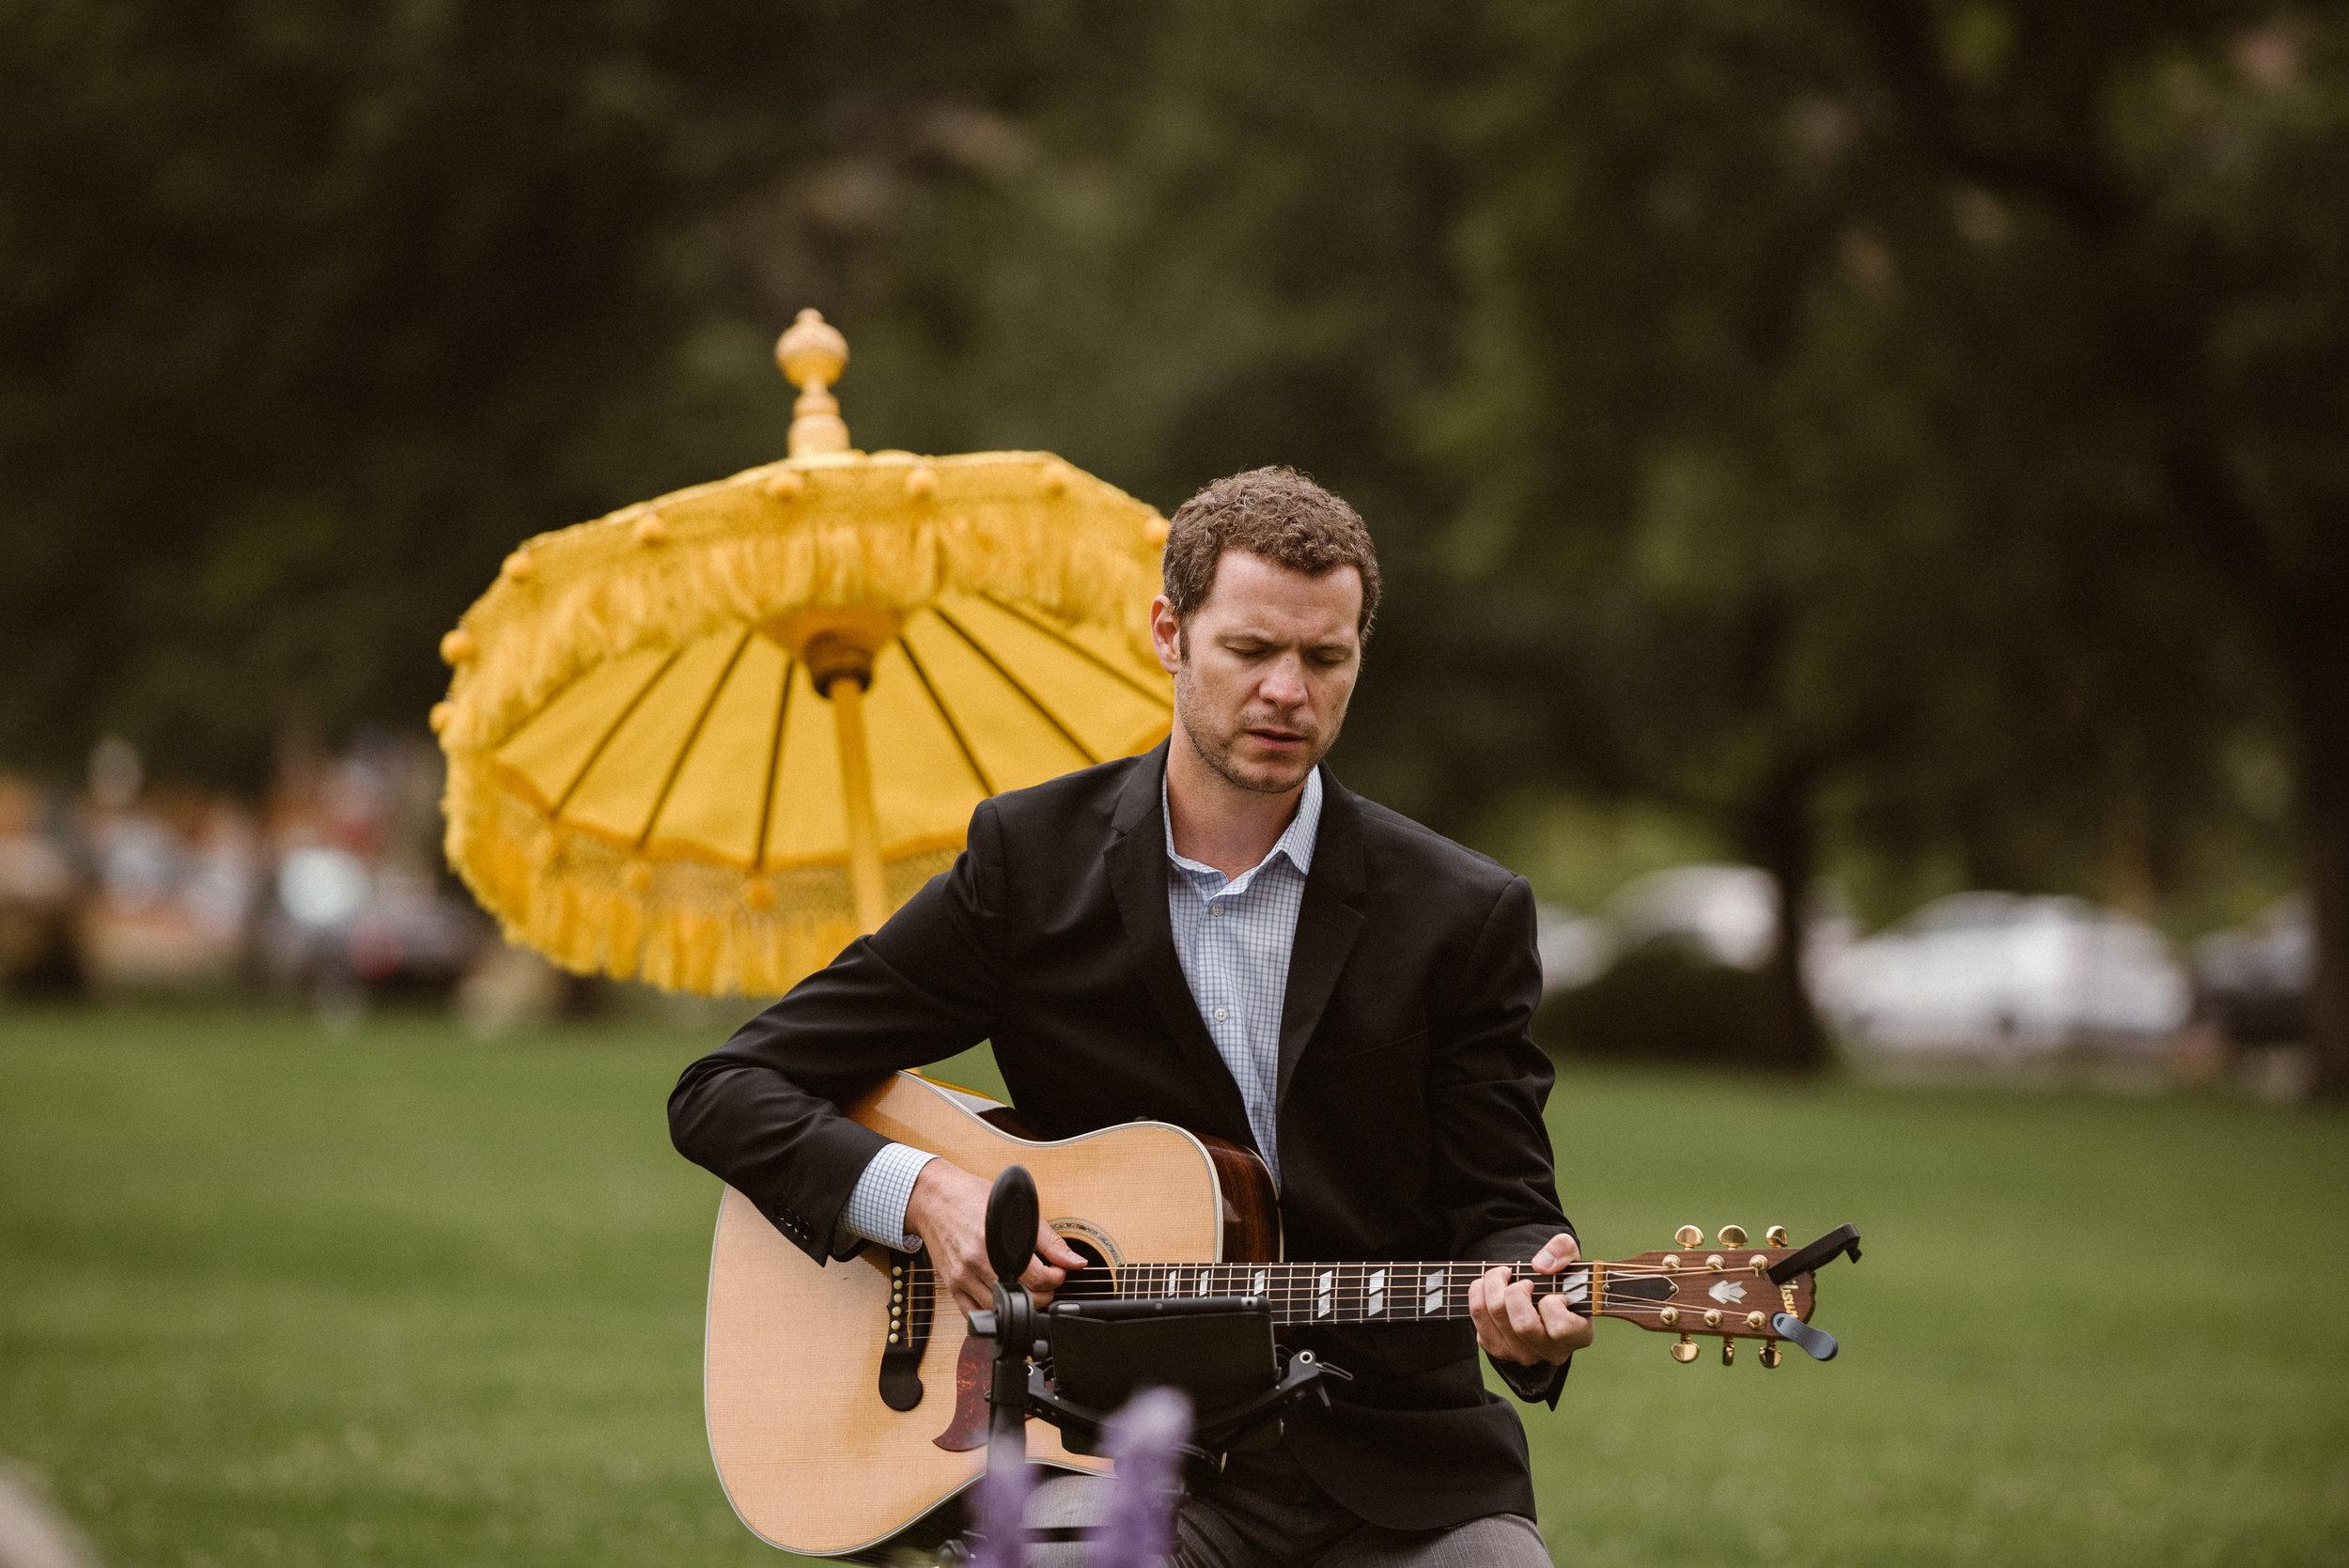 Chautauqua Park Wedding Ceremony with Chris Webb Music